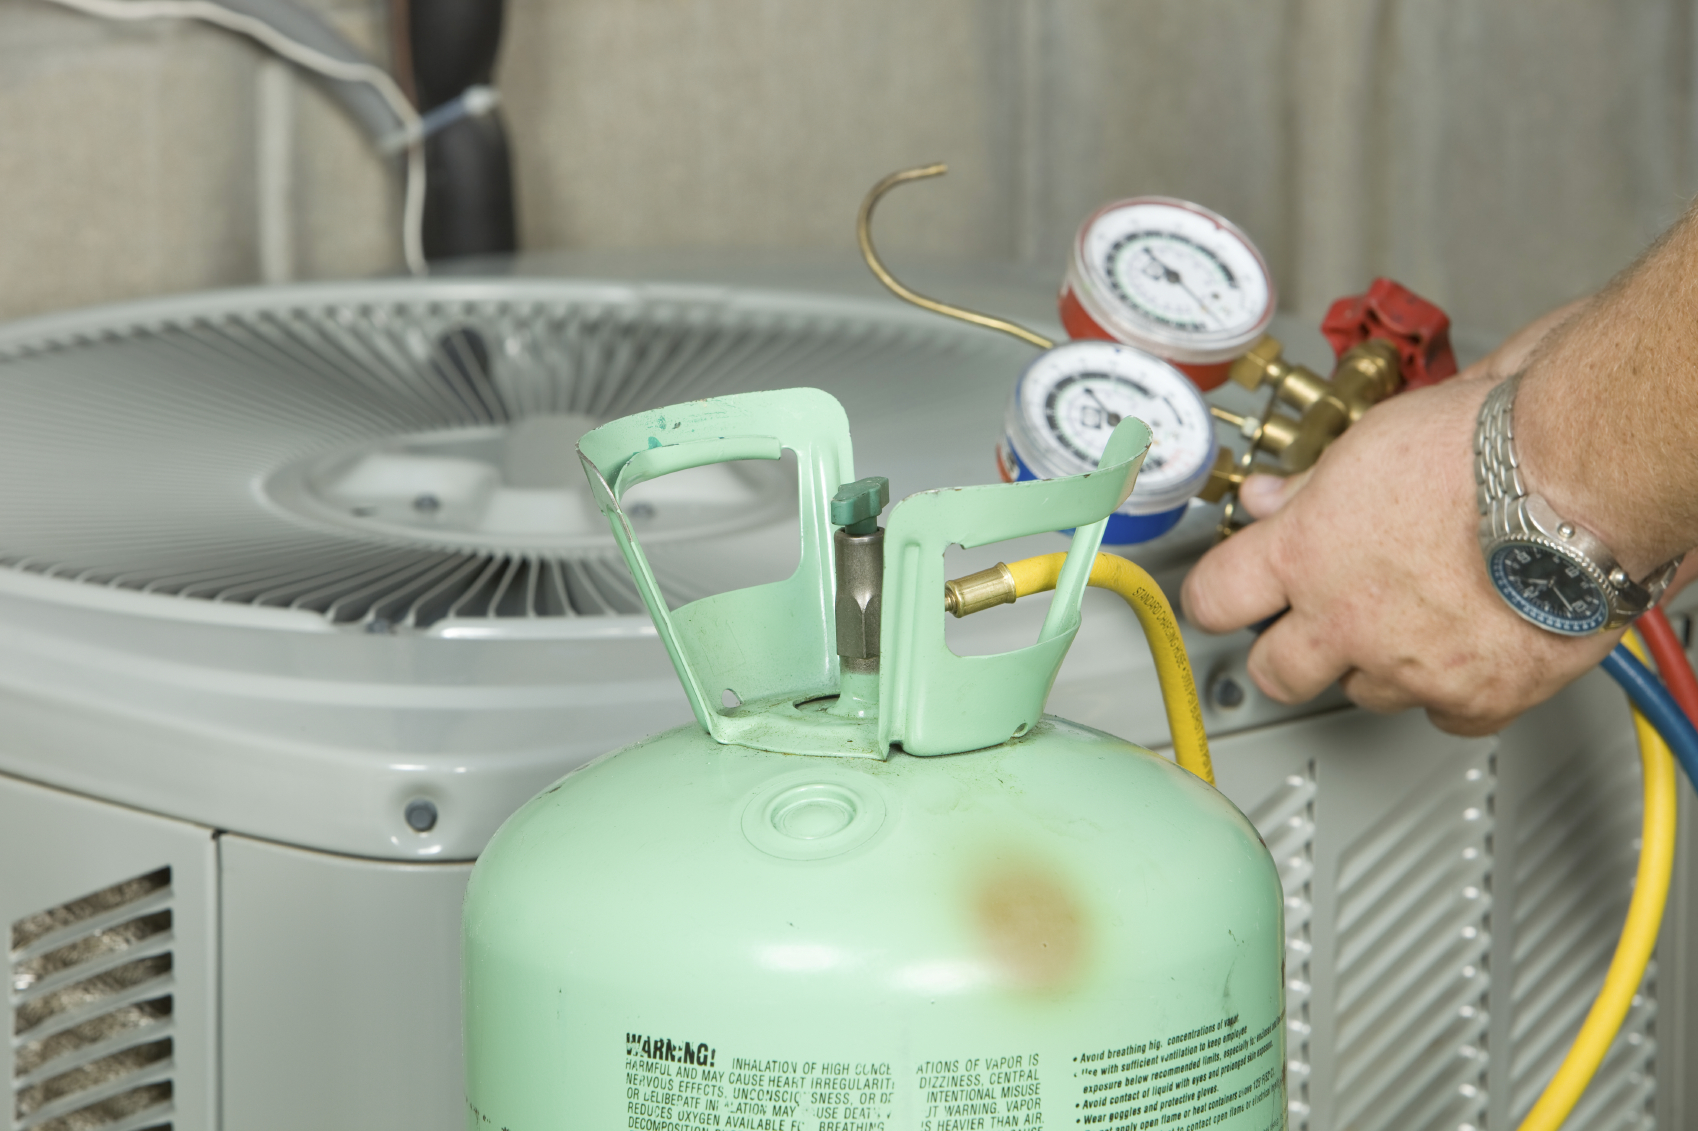 air-conditioning-breakdown-and-repair